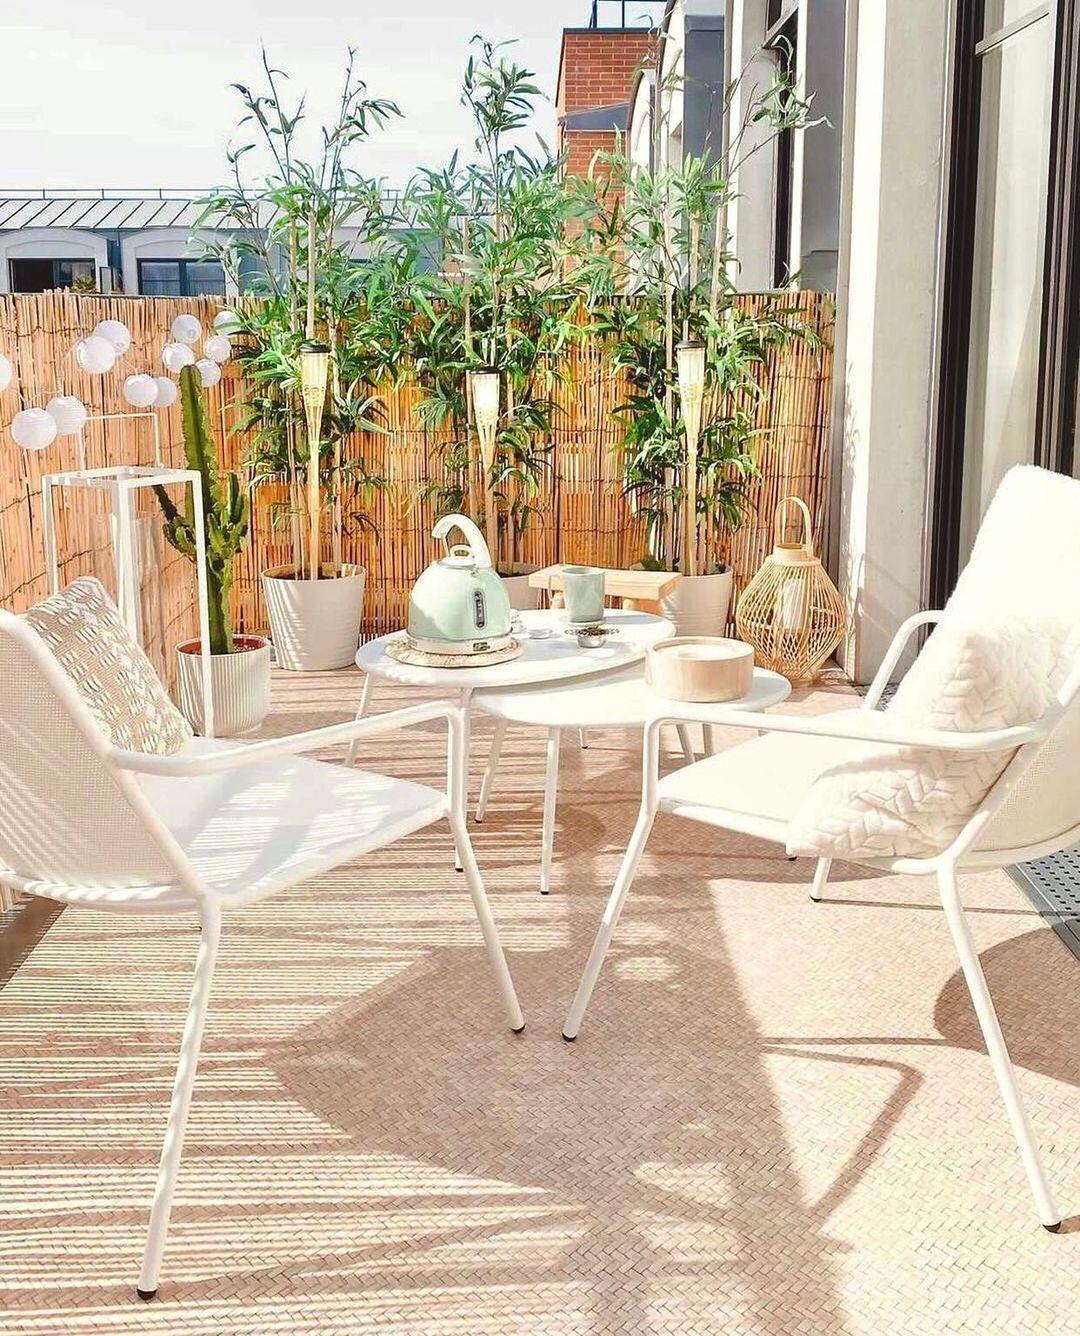 Terraza con alfombra imitando madera